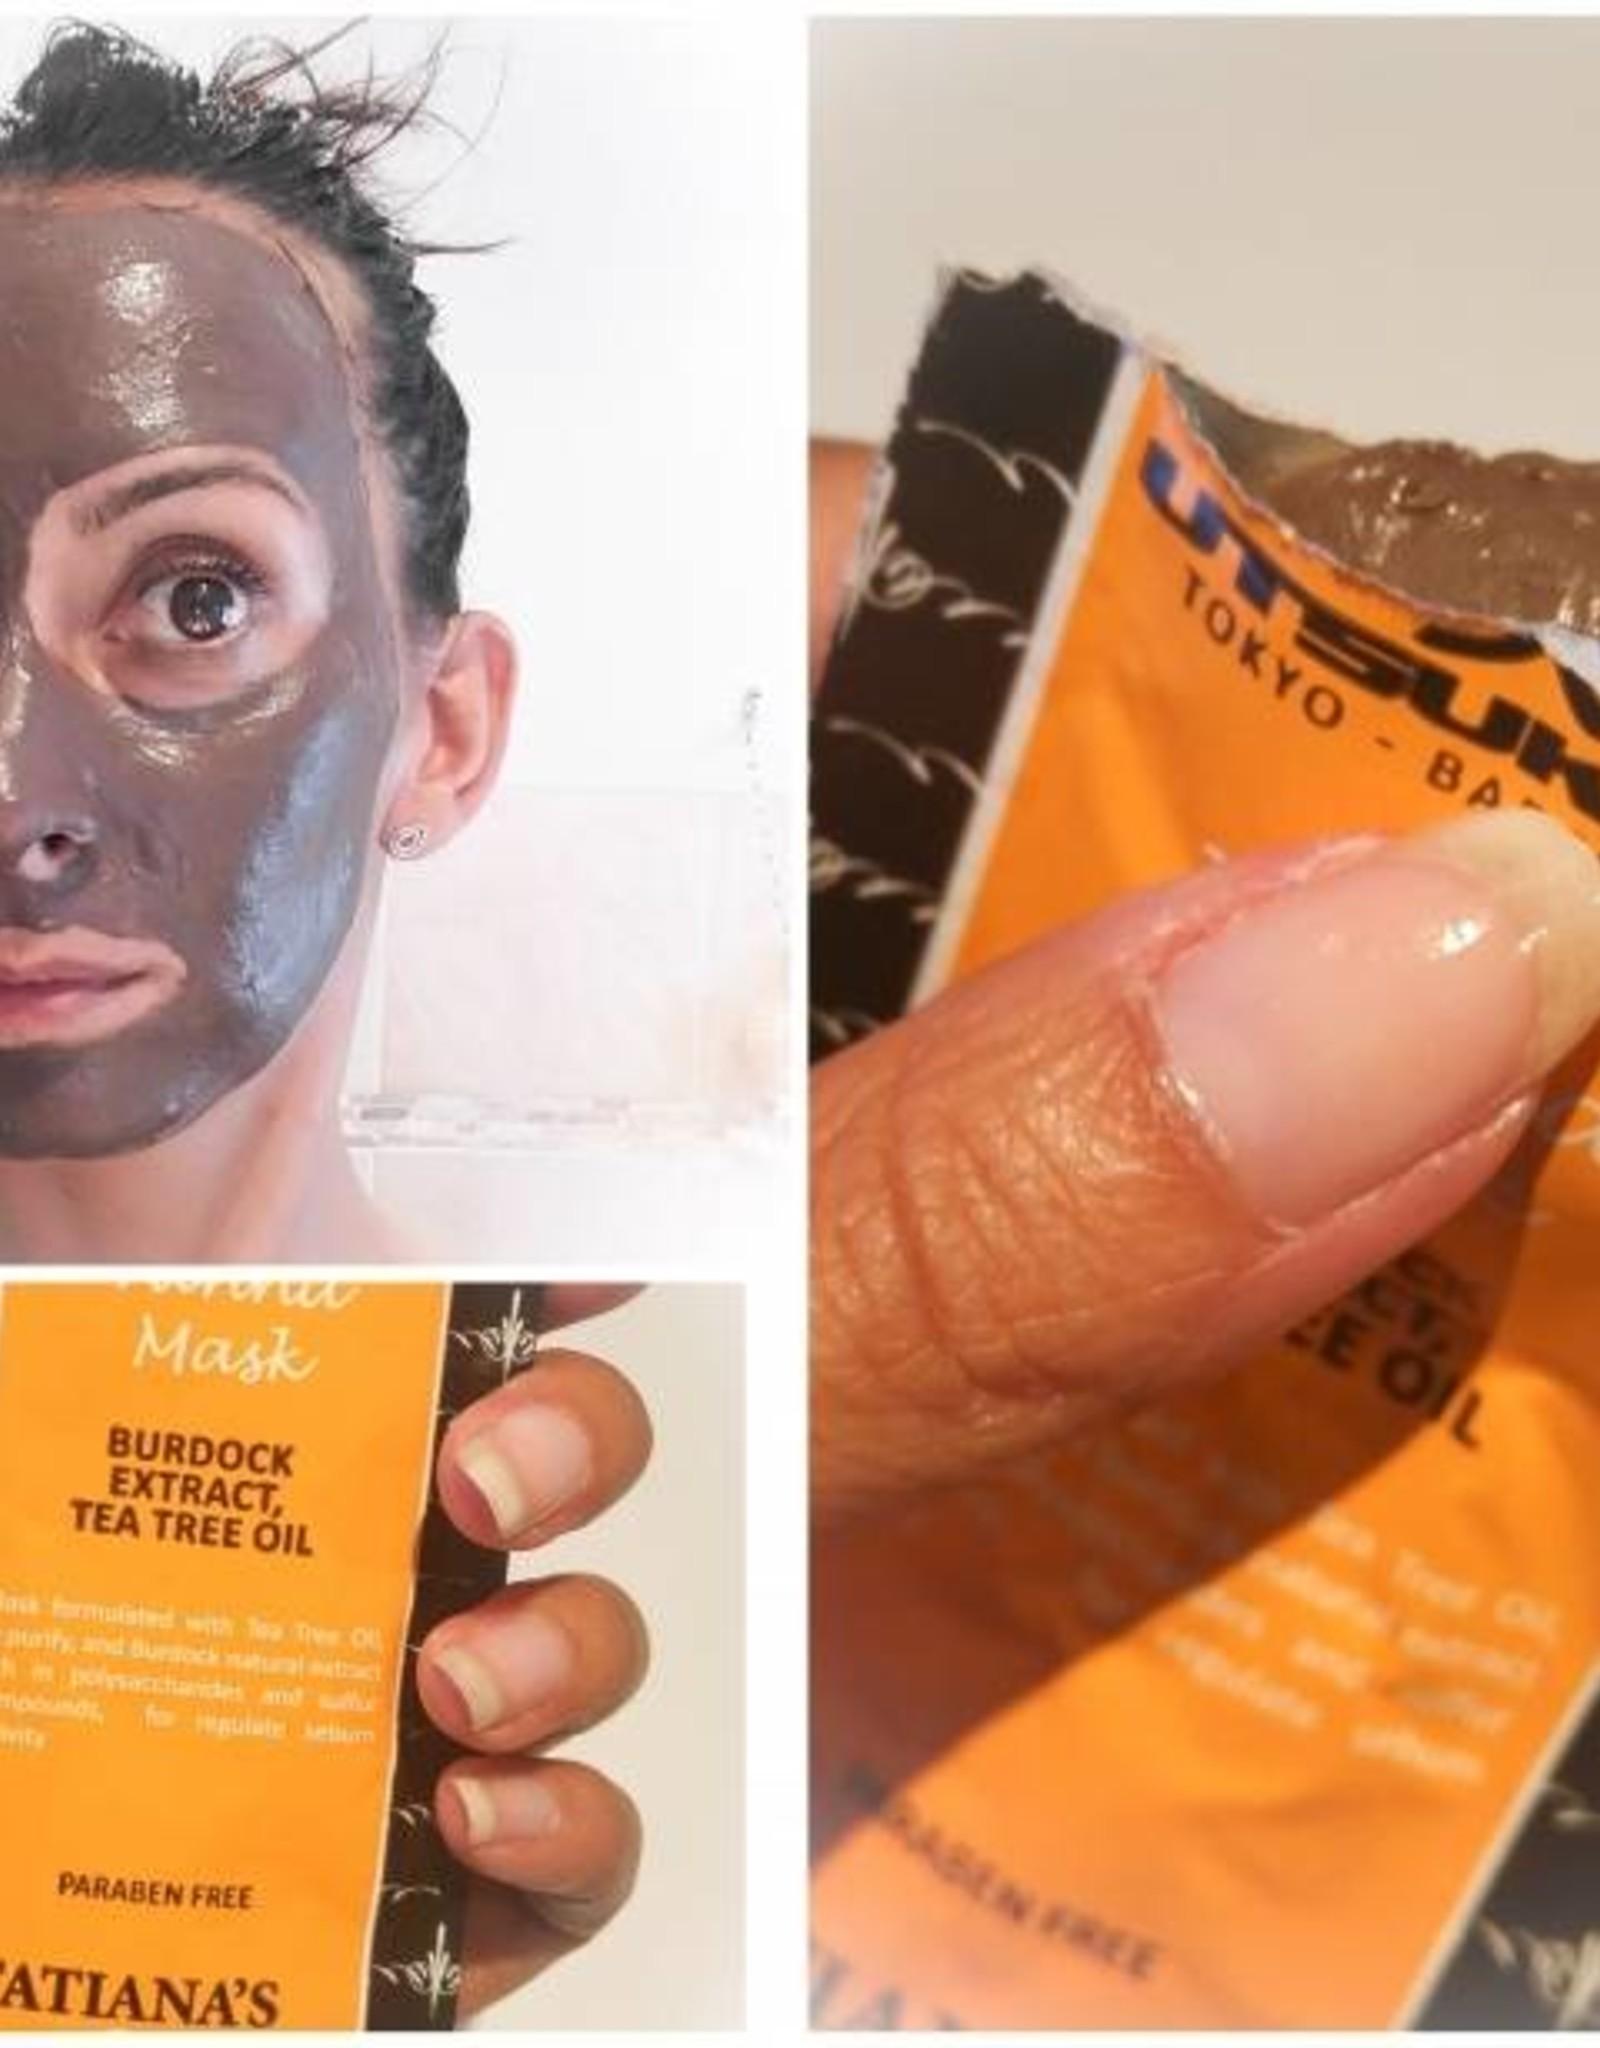 Utsukusy Burdock tea tree facial mask